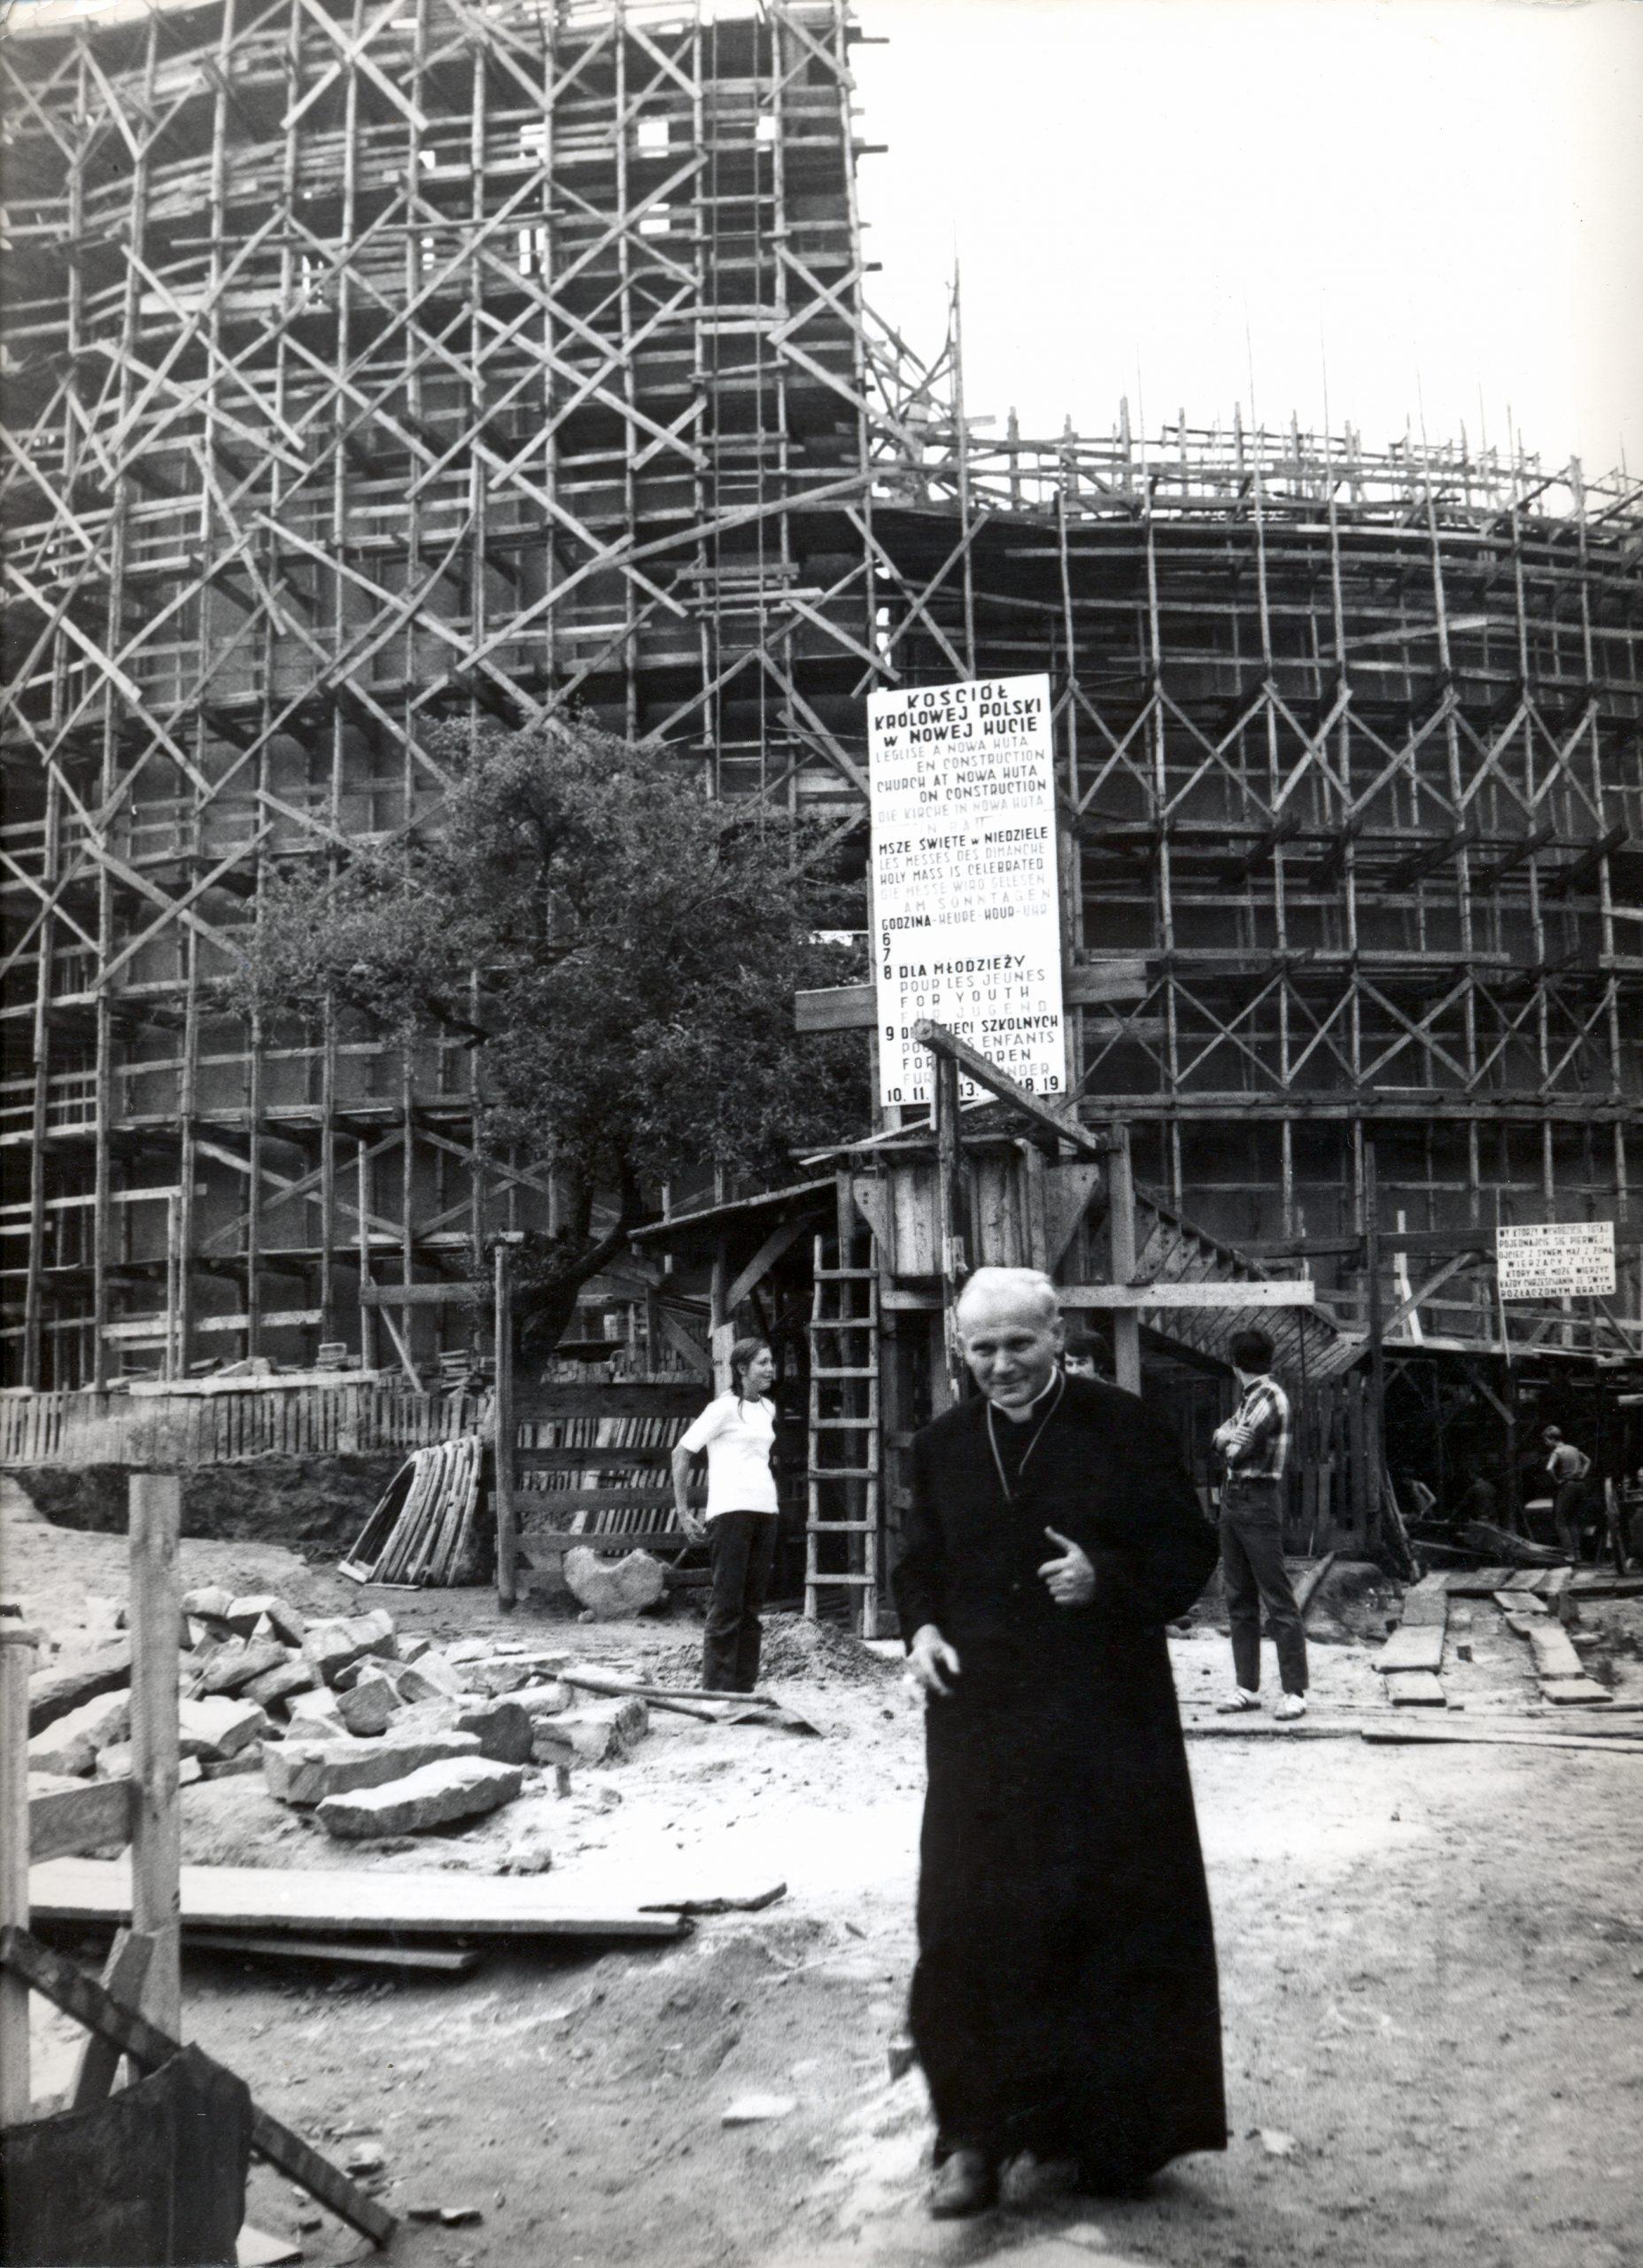 No tengais Miedo nos decía San Juan Pablo II